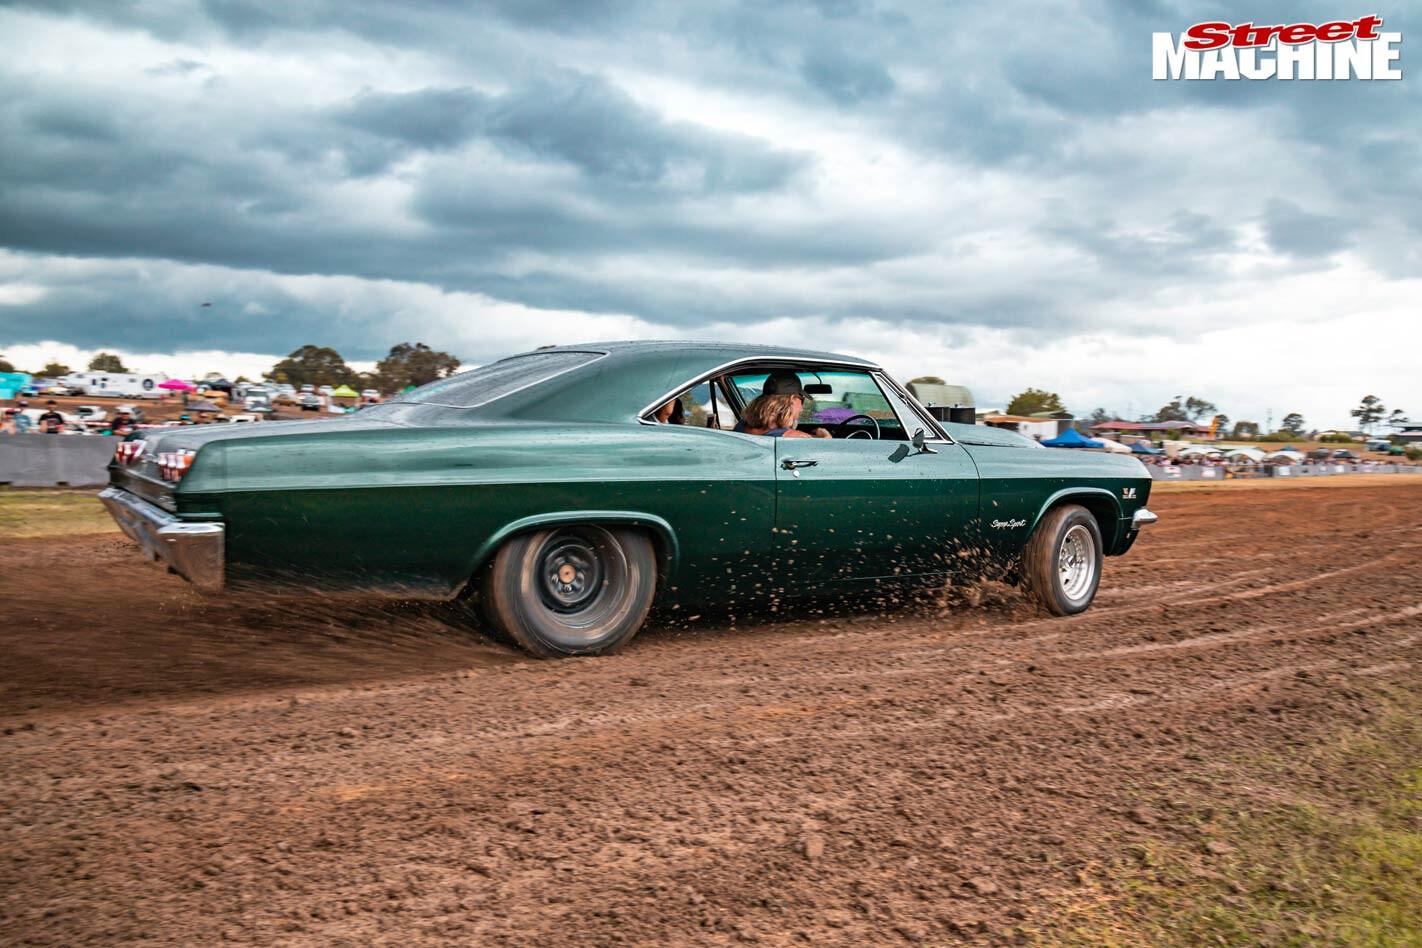 1965 Chev Impala